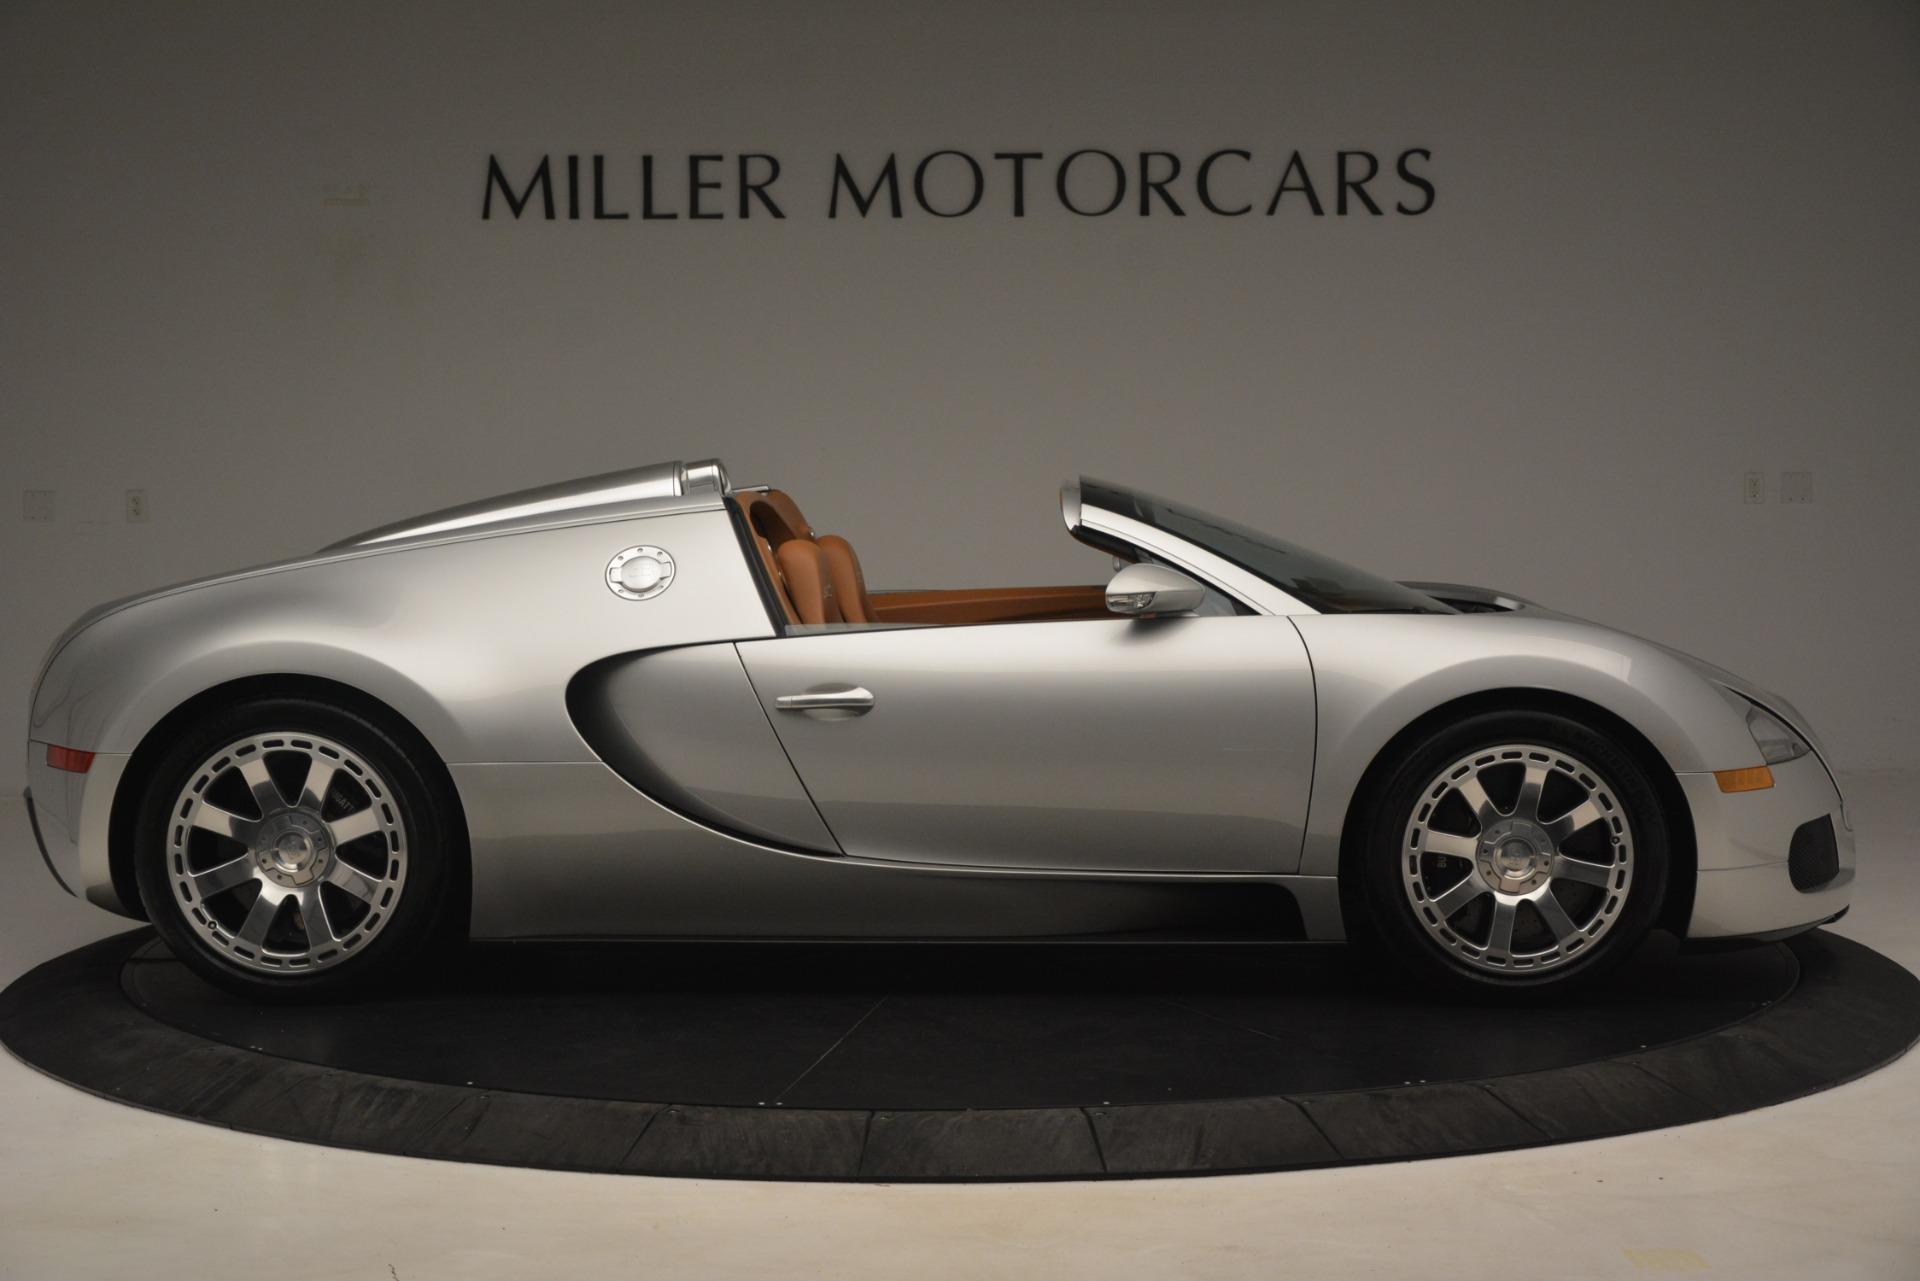 Used 2010 Bugatti Veyron 16.4 Grand Sport For Sale In Greenwich, CT 3159_p10